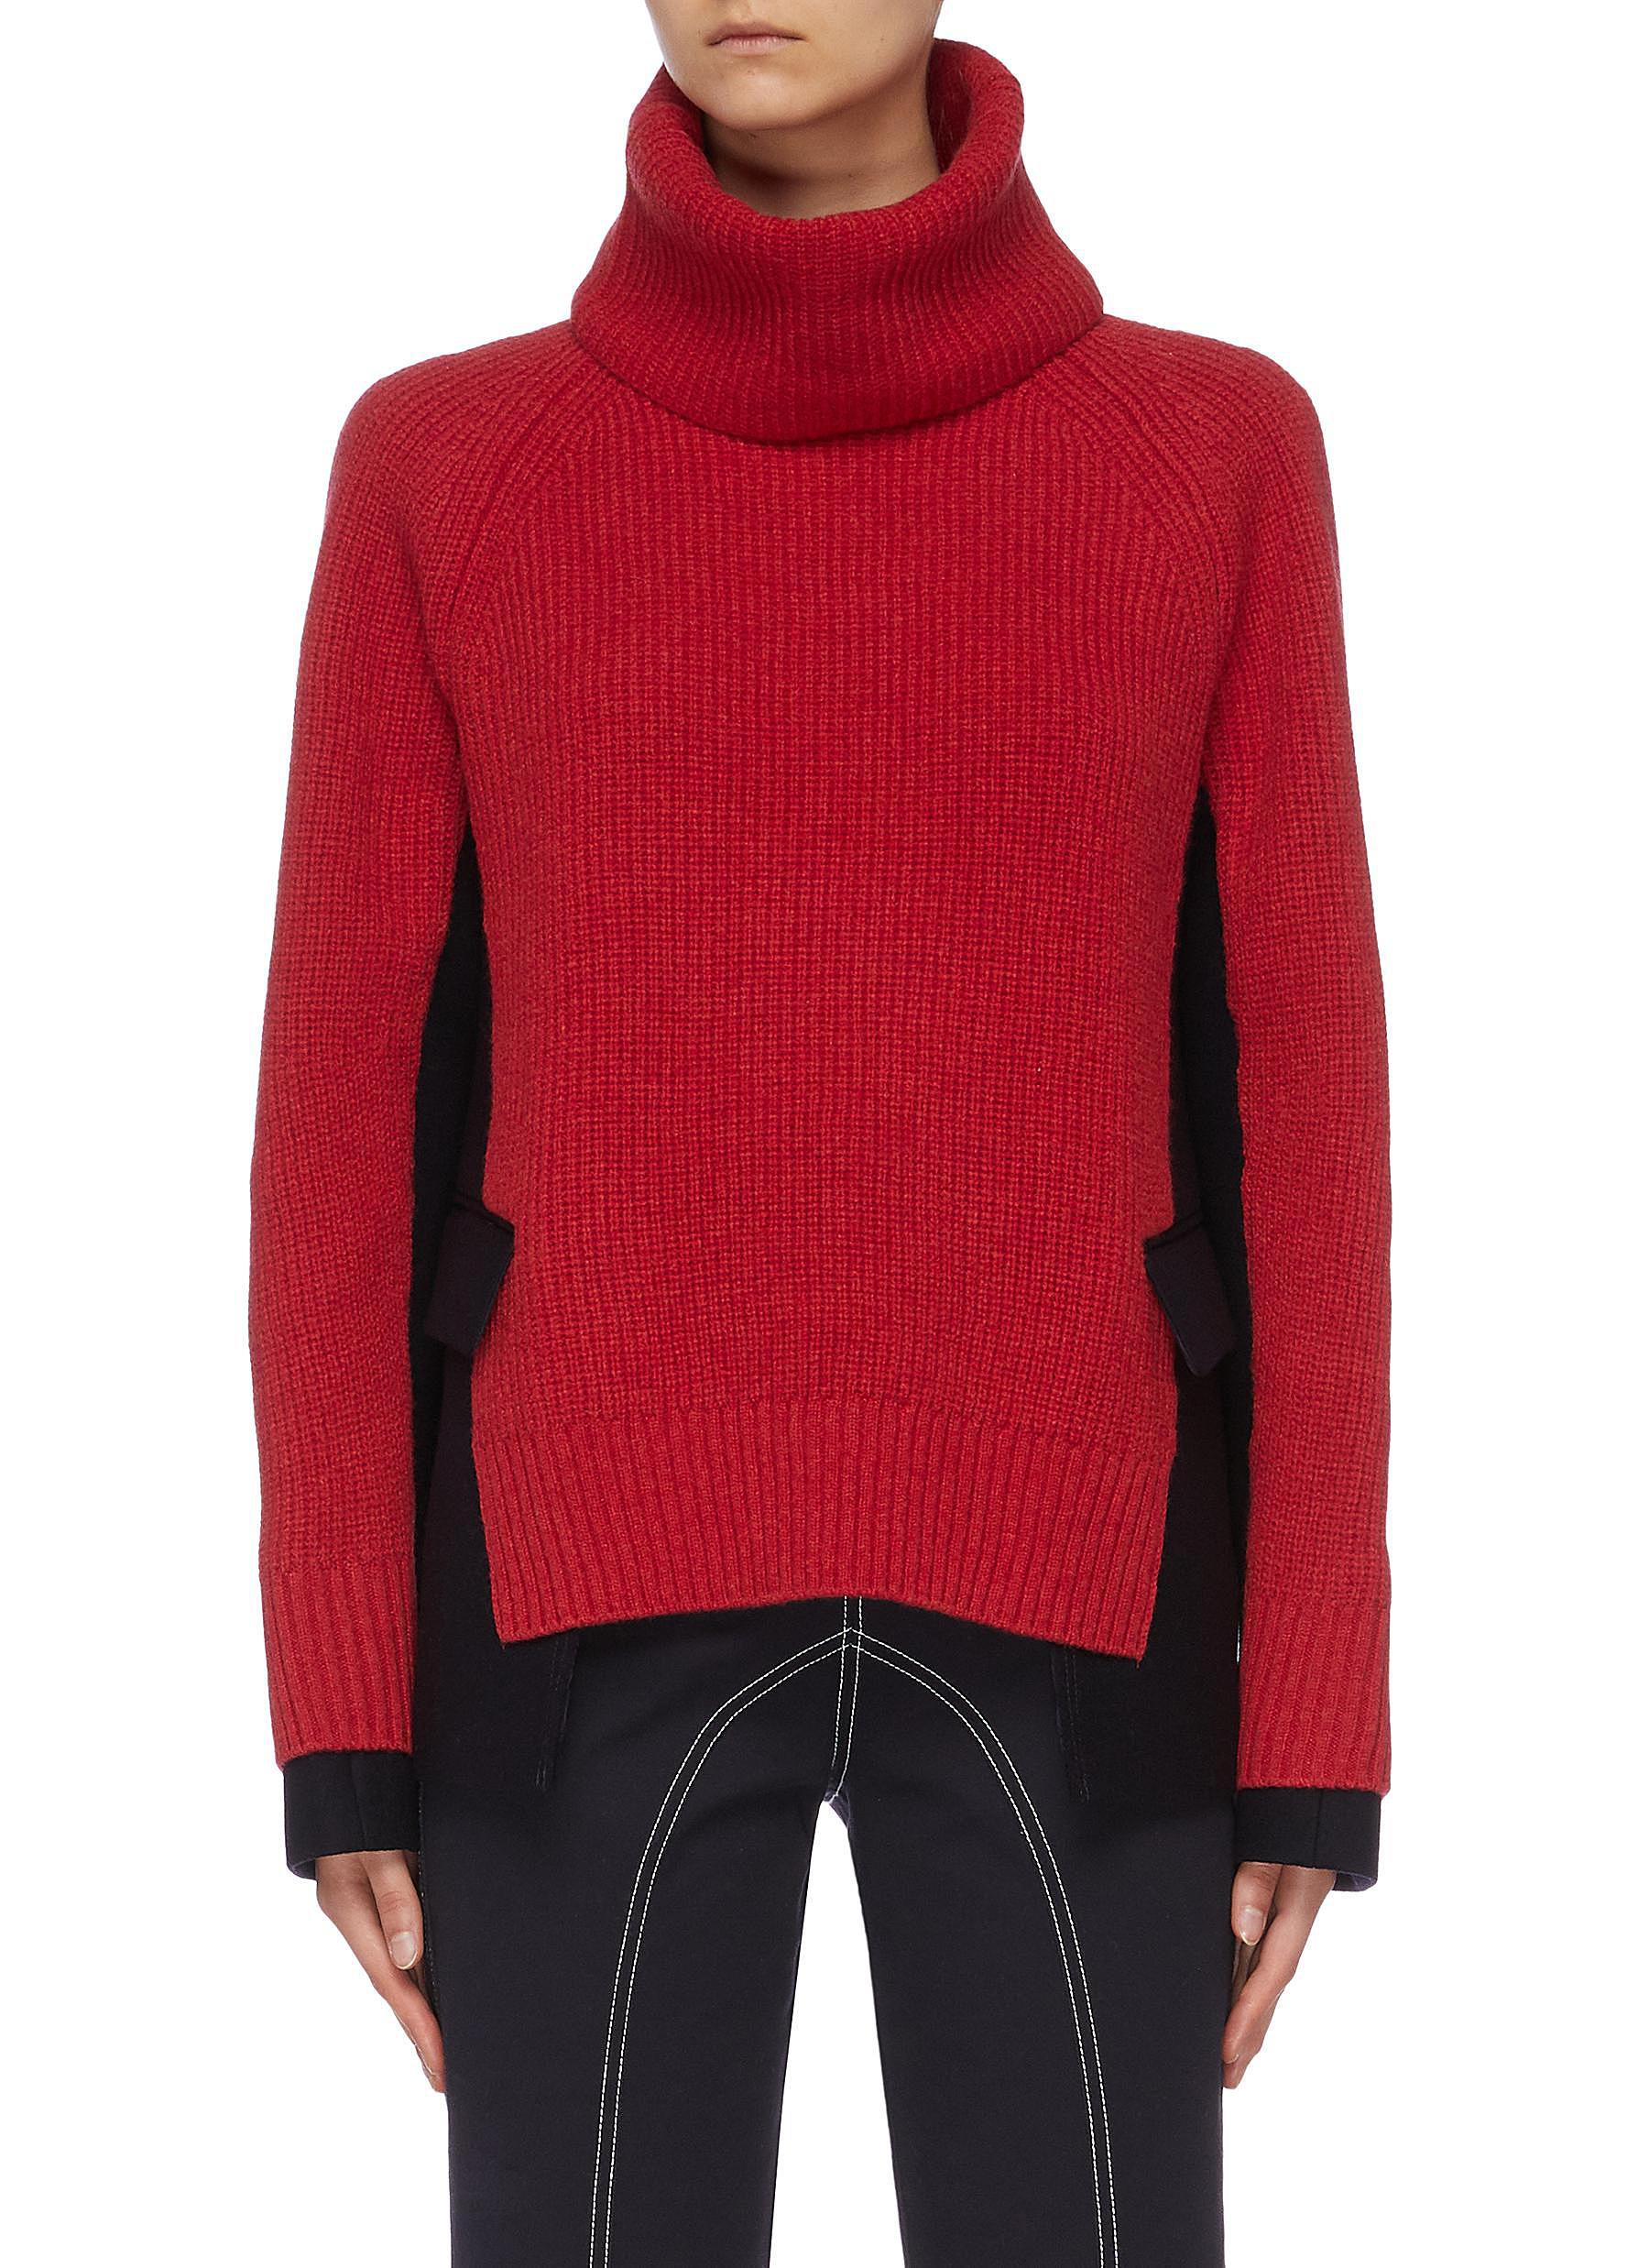 Detachable turtleneck contrast blazer panel sweater by Sacai